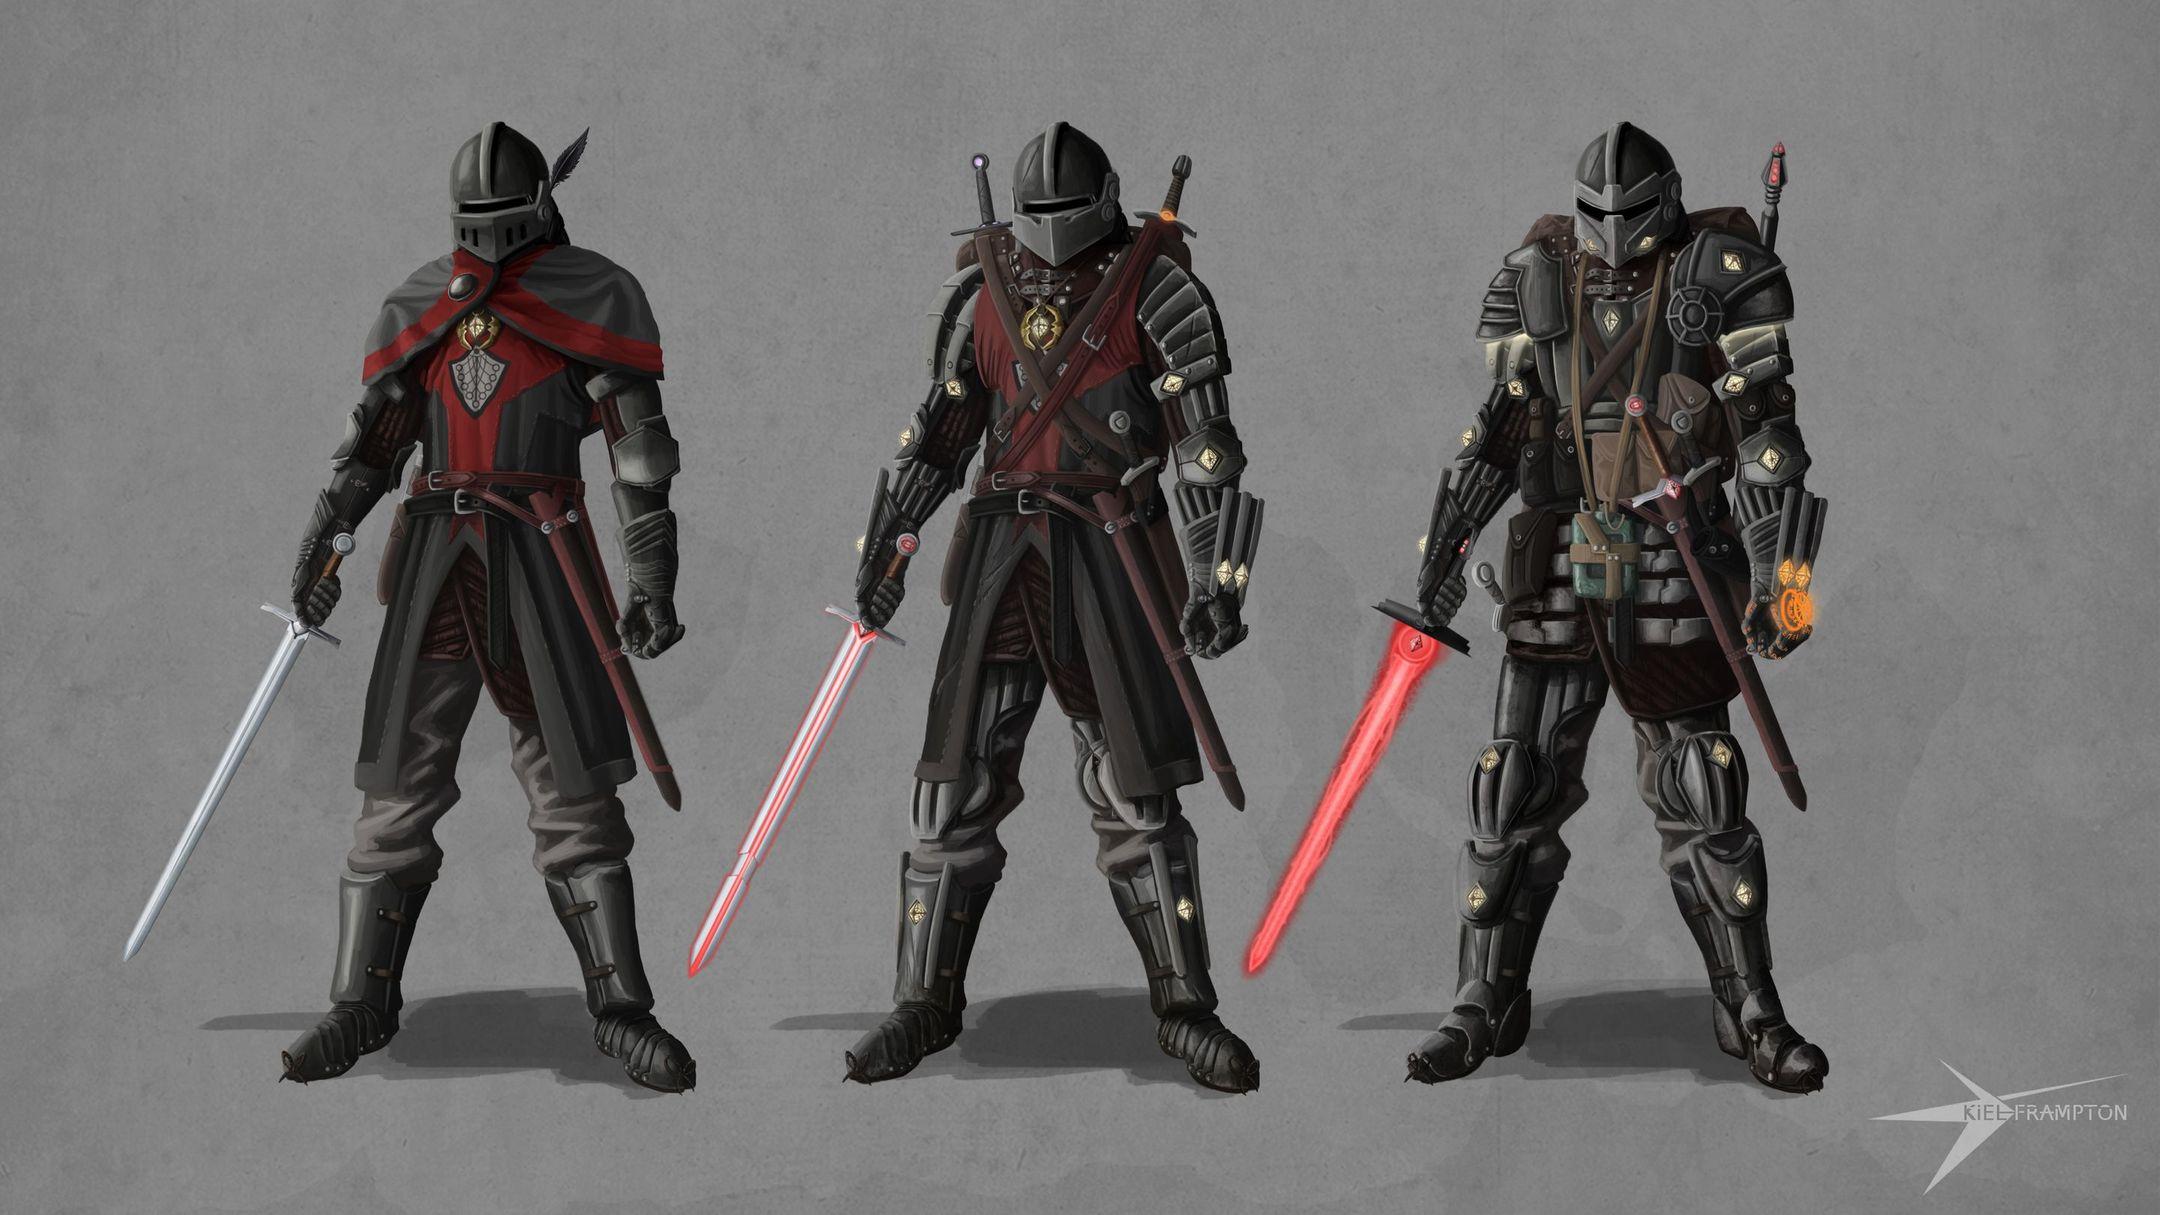 Riftblade: Fantasy Soldier